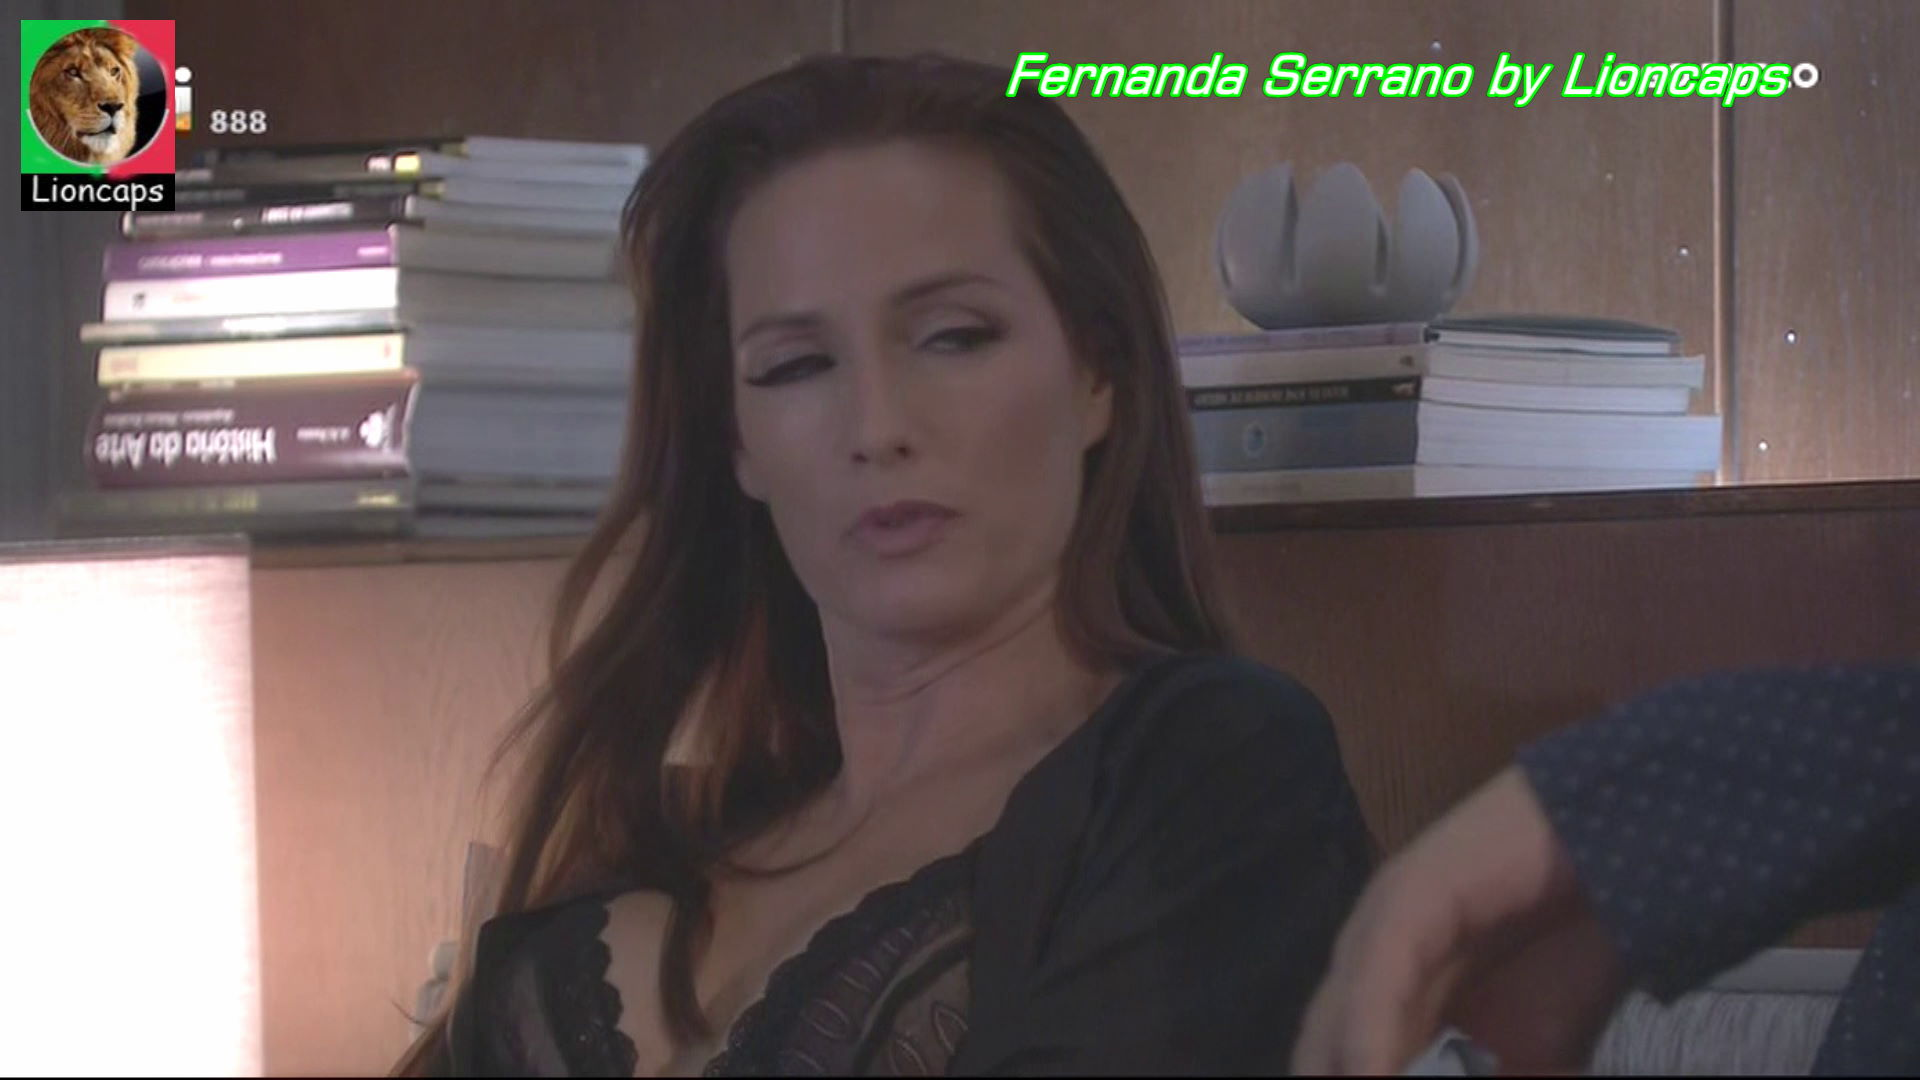 066807139_fernanda_serrano_vs180104_0497_122_951lo.JPG